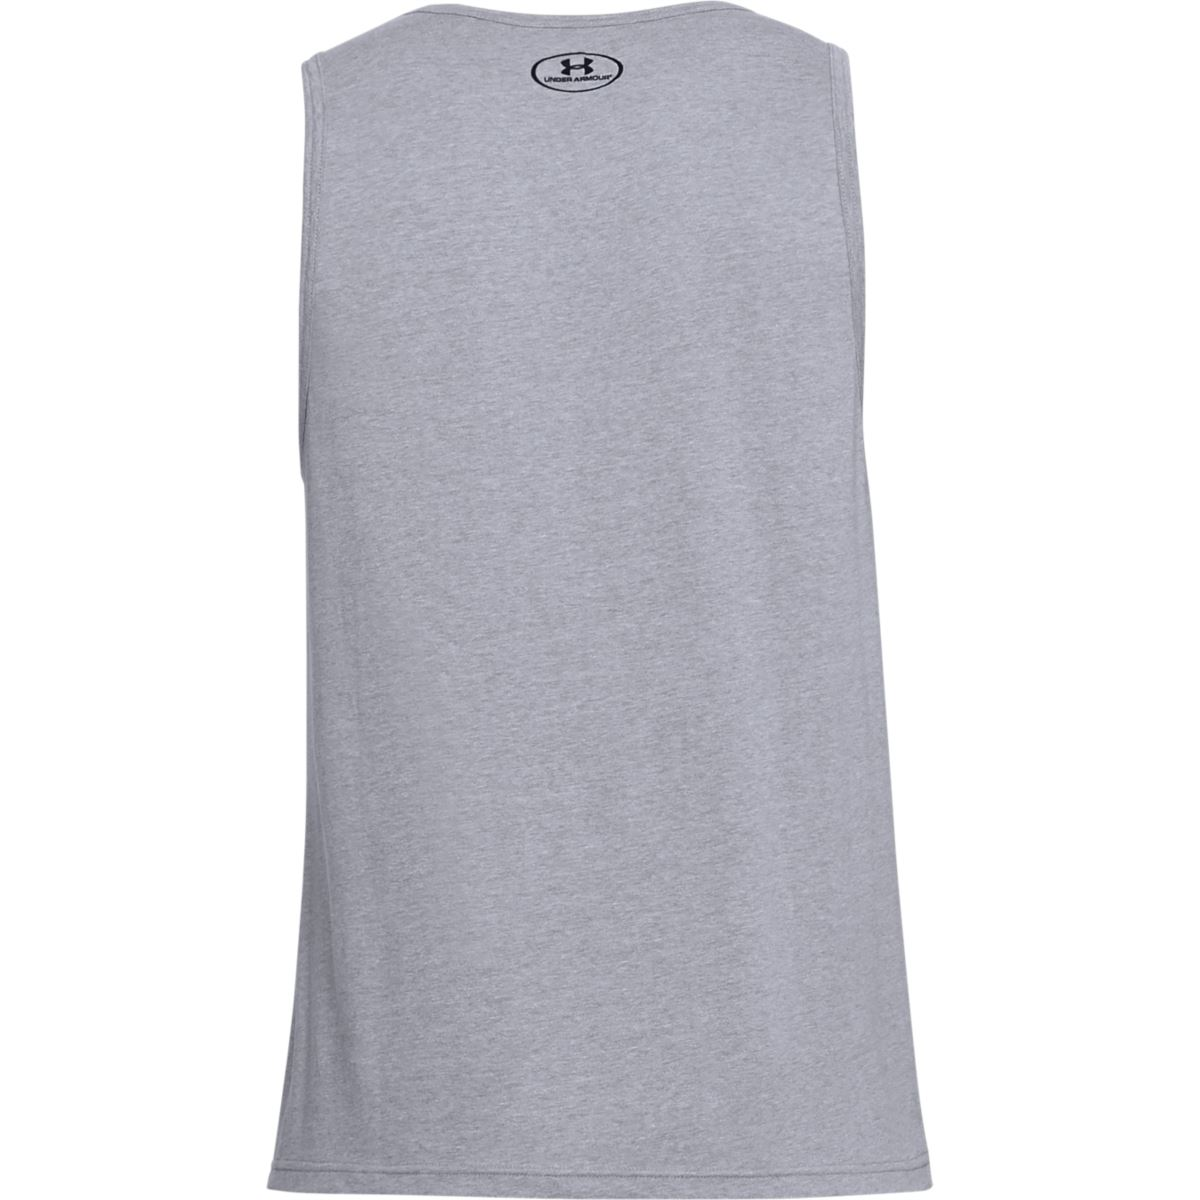 Under-Armour-2019-Mens-UA-Sportstyle-Logo-Tank-Top-Sleeveless-Cotton-Vest thumbnail 5